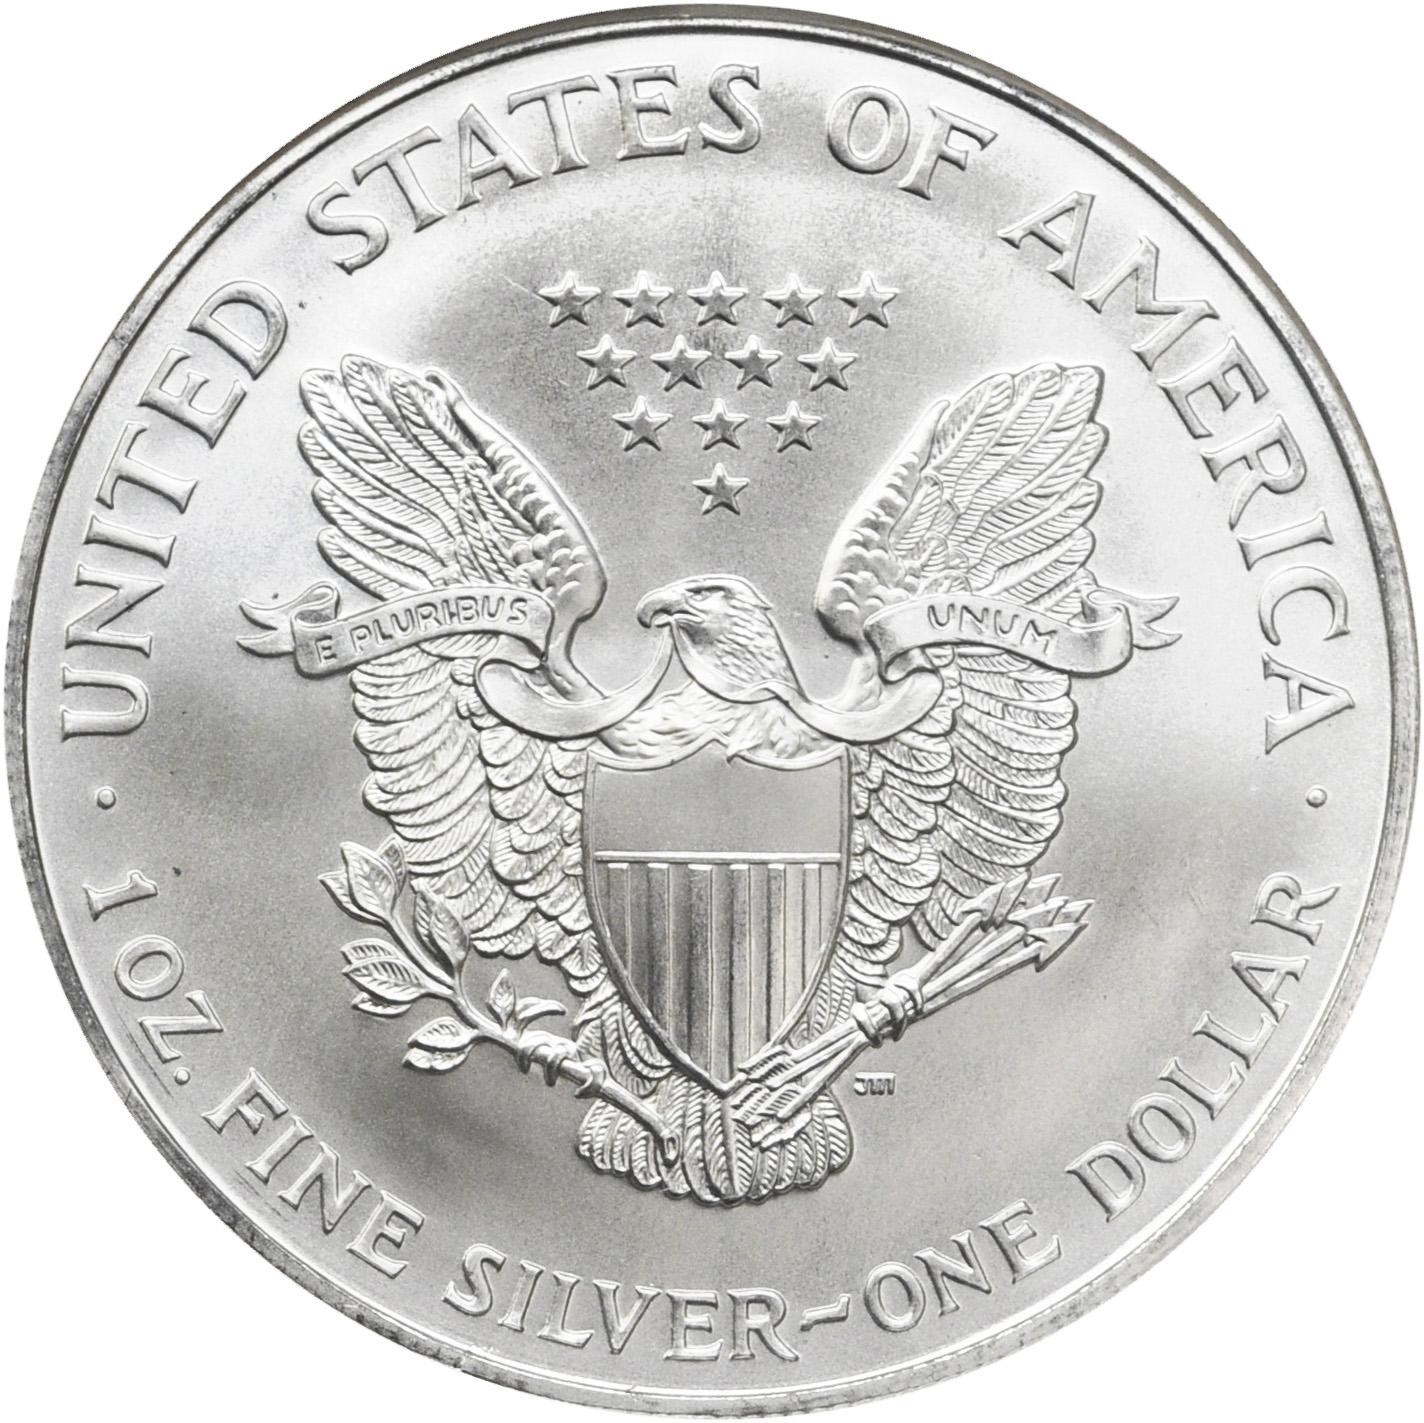 Value Of 1996 1 Silver Coin American Silver Eagle Coin